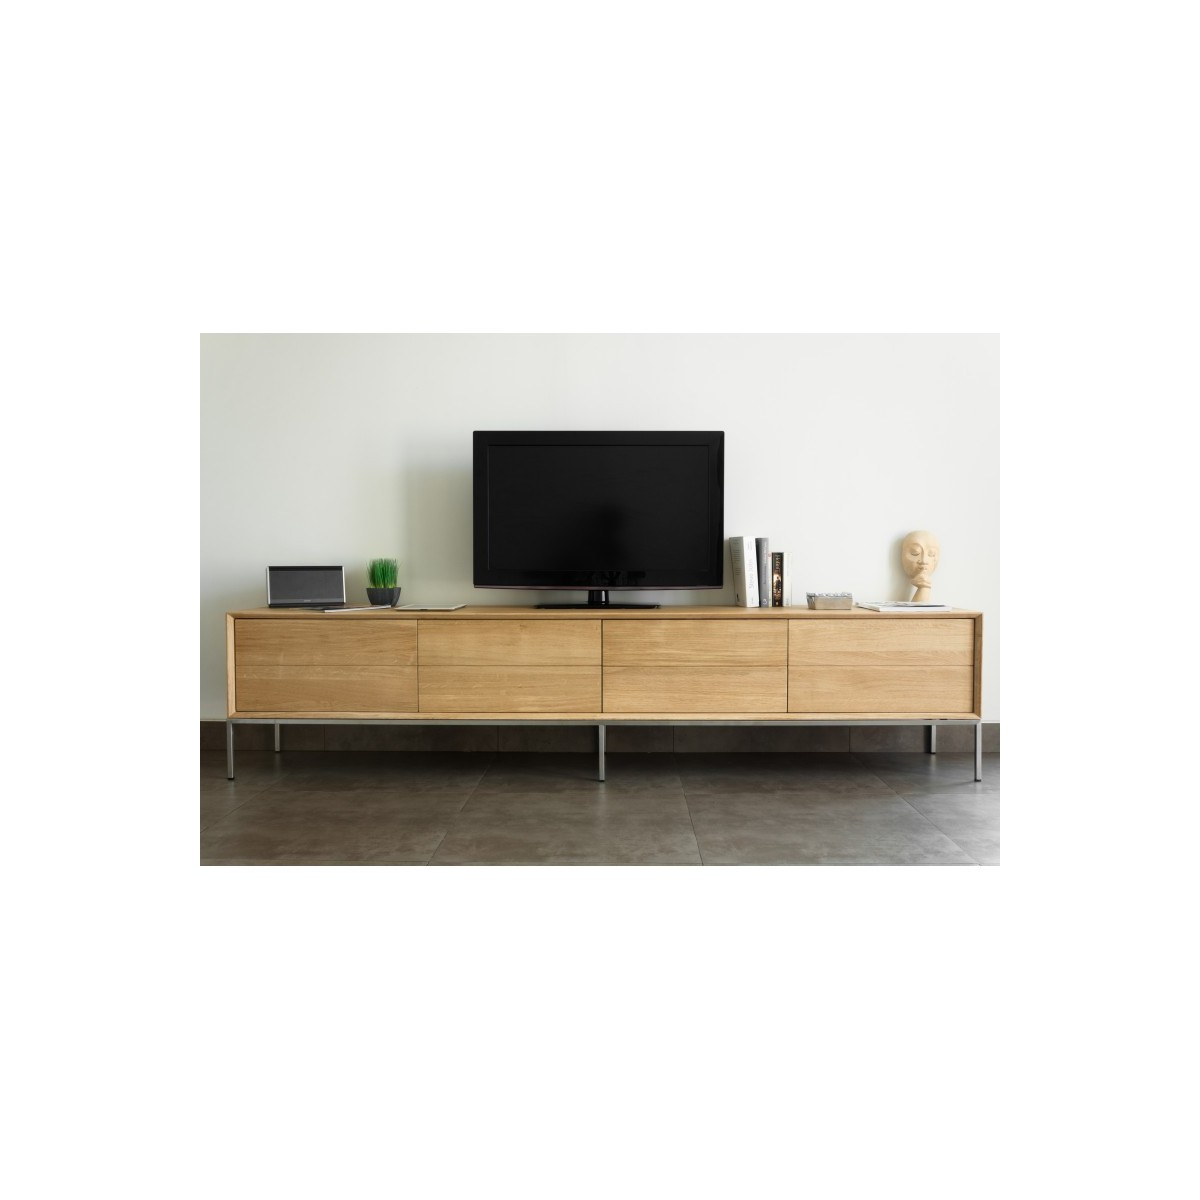 meuble tv bas design 2 tiroirs 2 portes jason en chene massif chene naturel amp story 4220